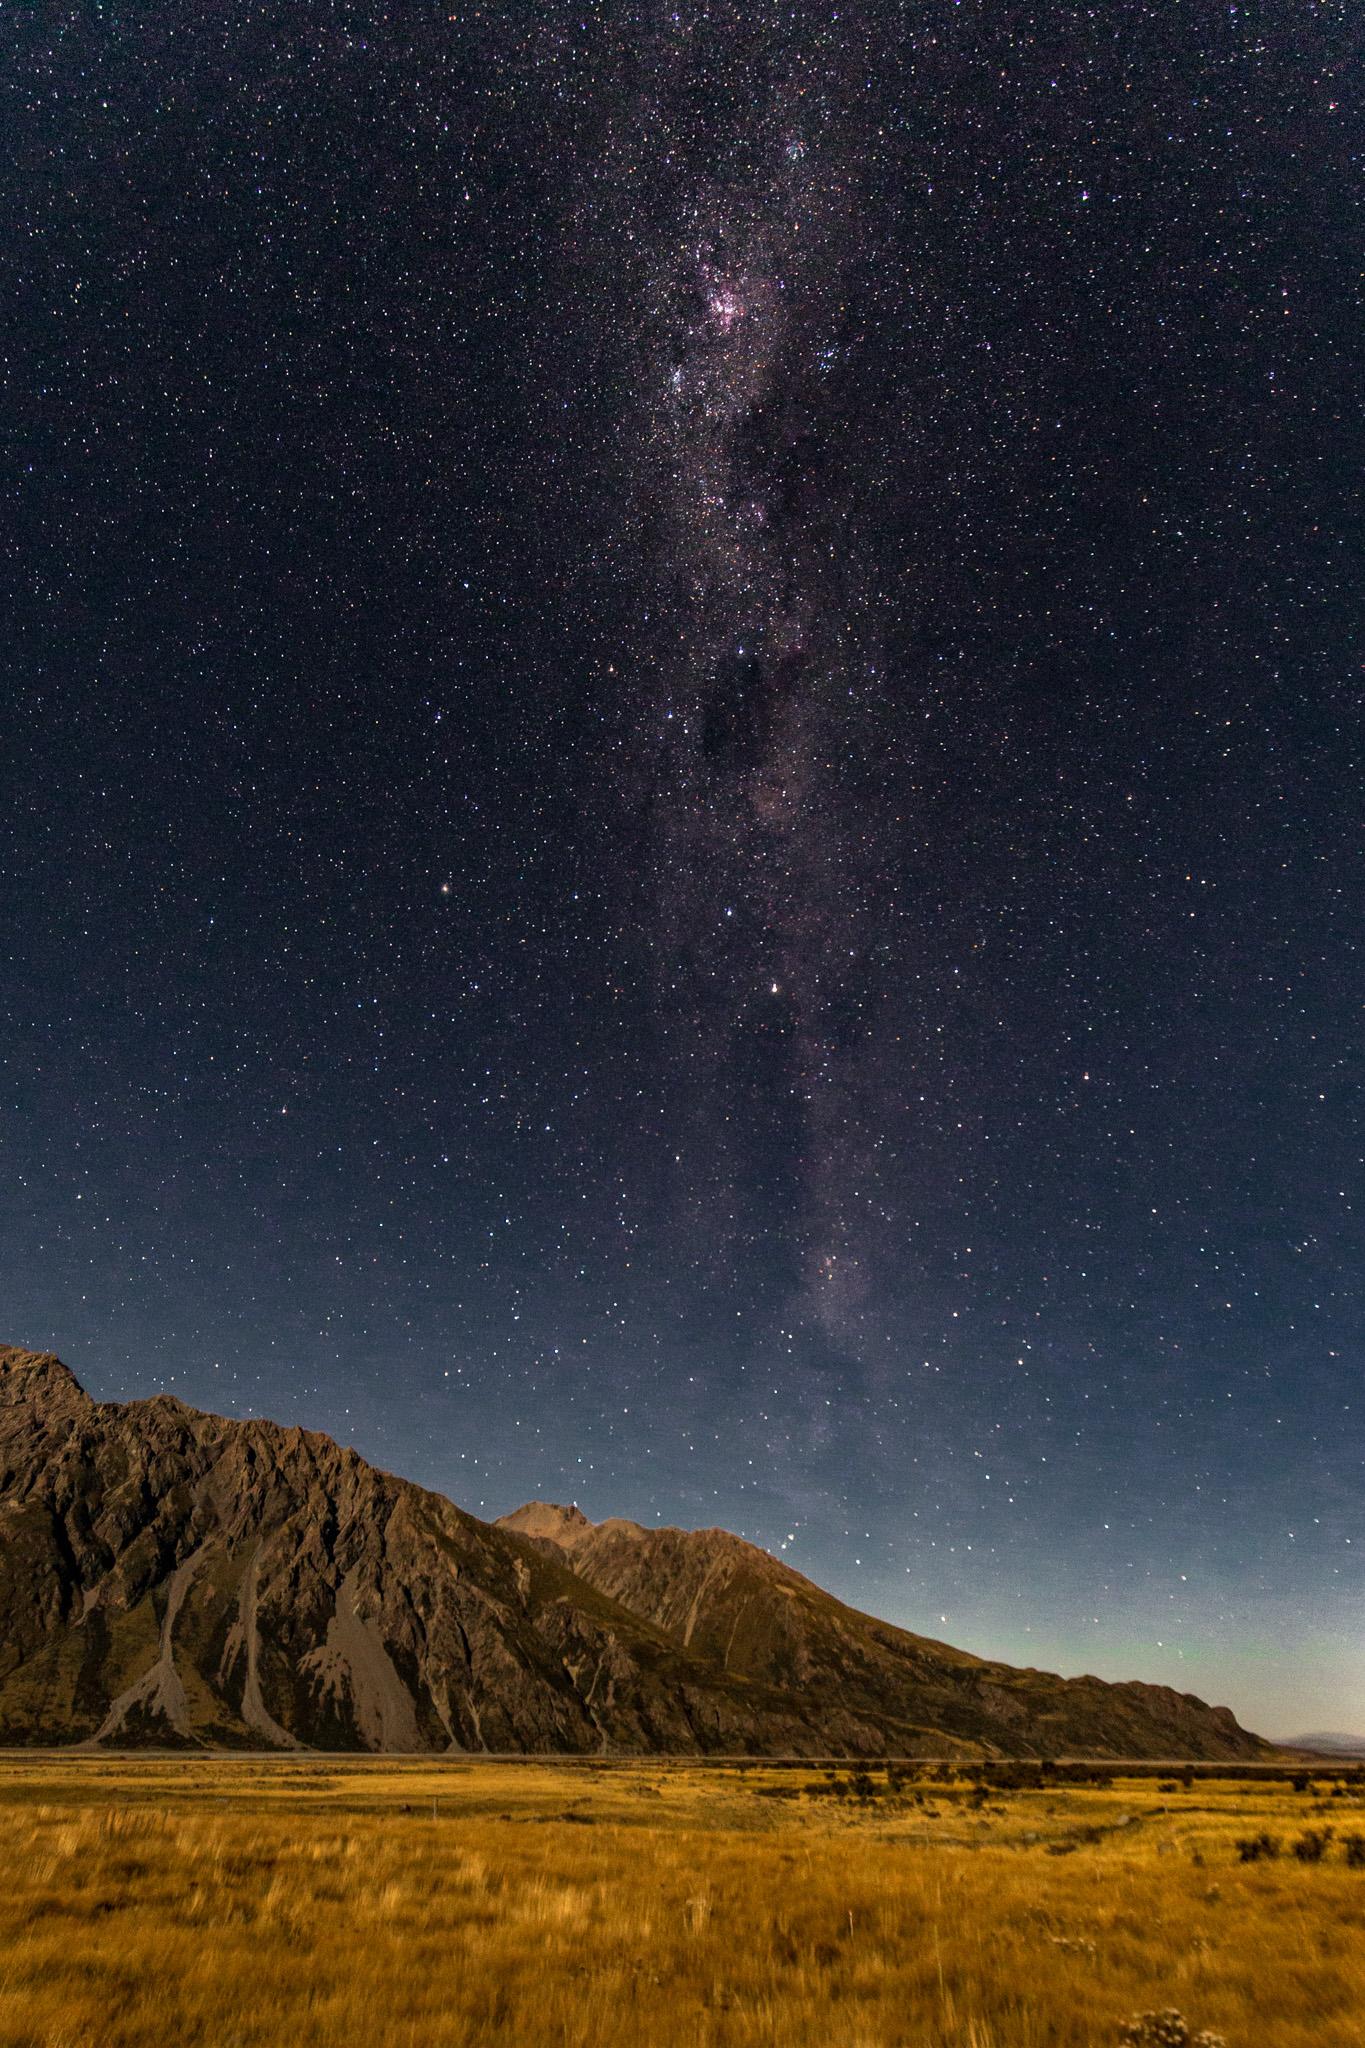 The Milky Way over the Tasman Valley /Aoraki/Mount Cook National Park